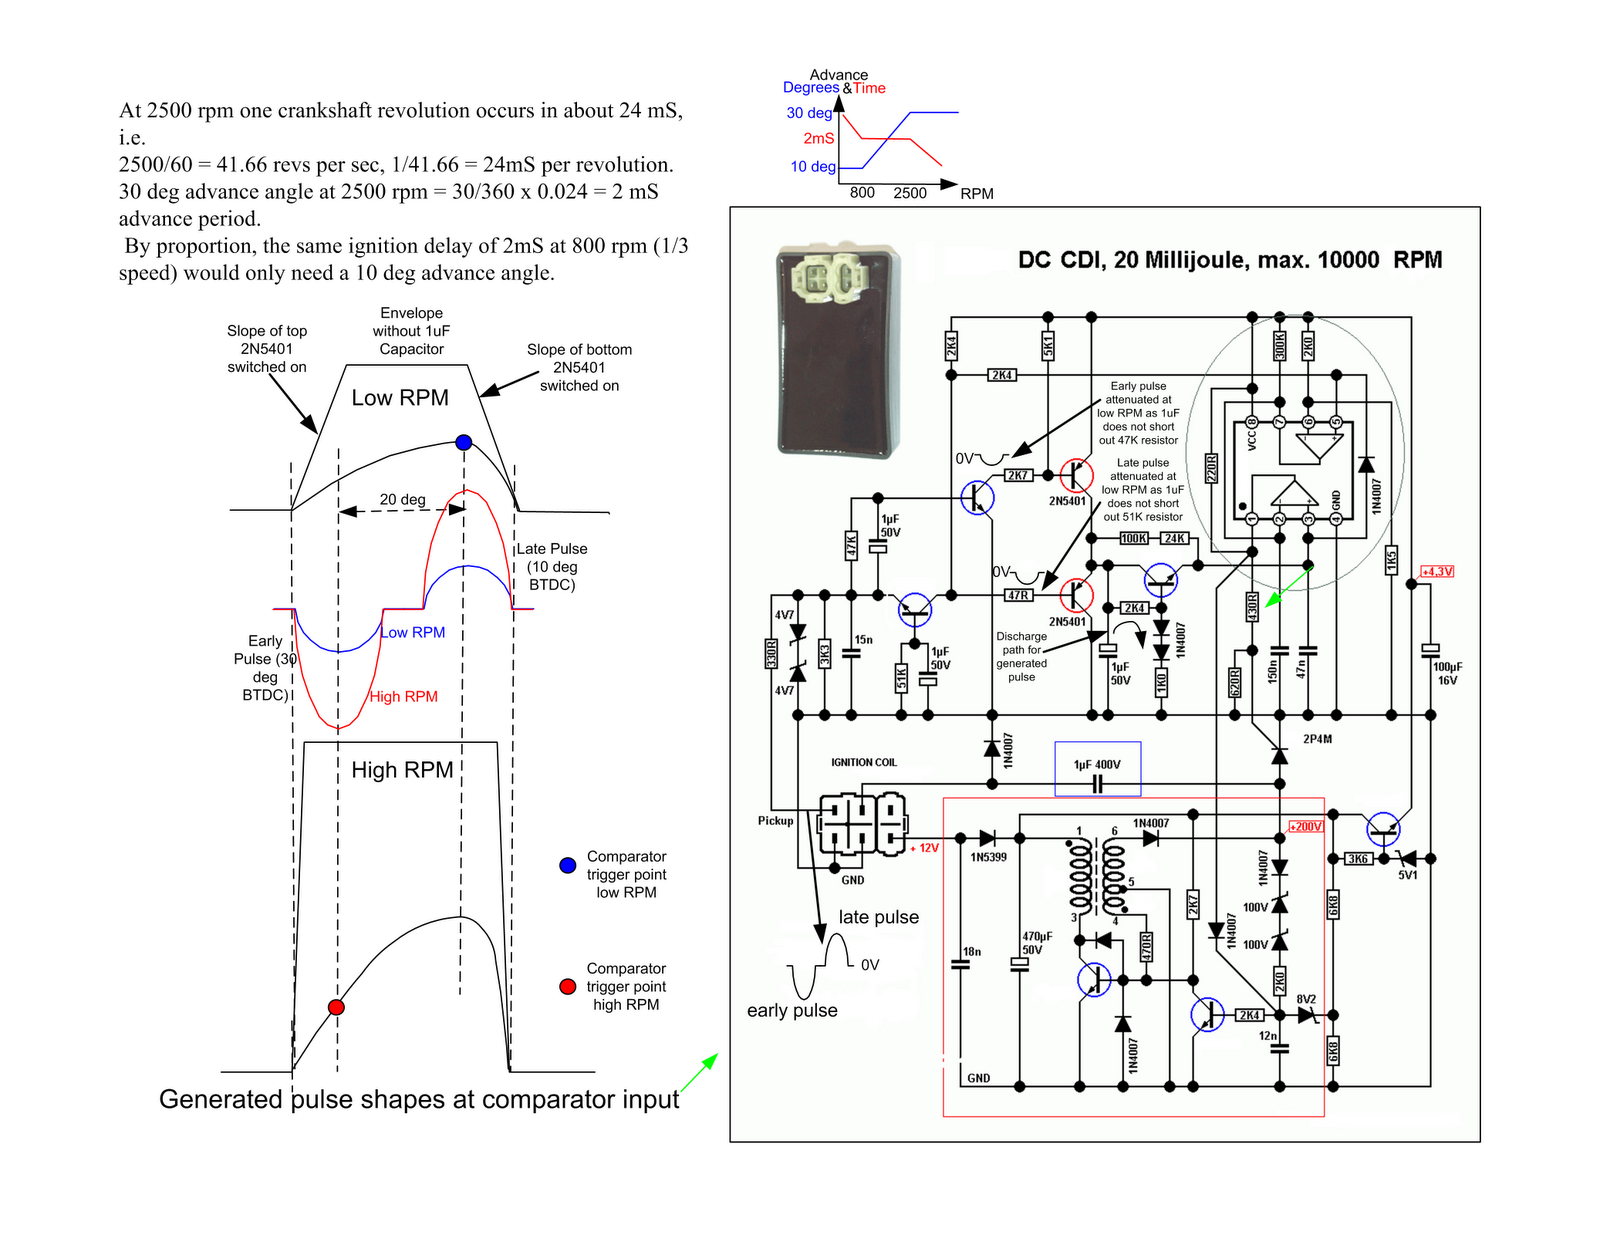 lifan 110 wiring diagram 2007 whirlpool quiet partner 2 hydraulic, Wiring diagram